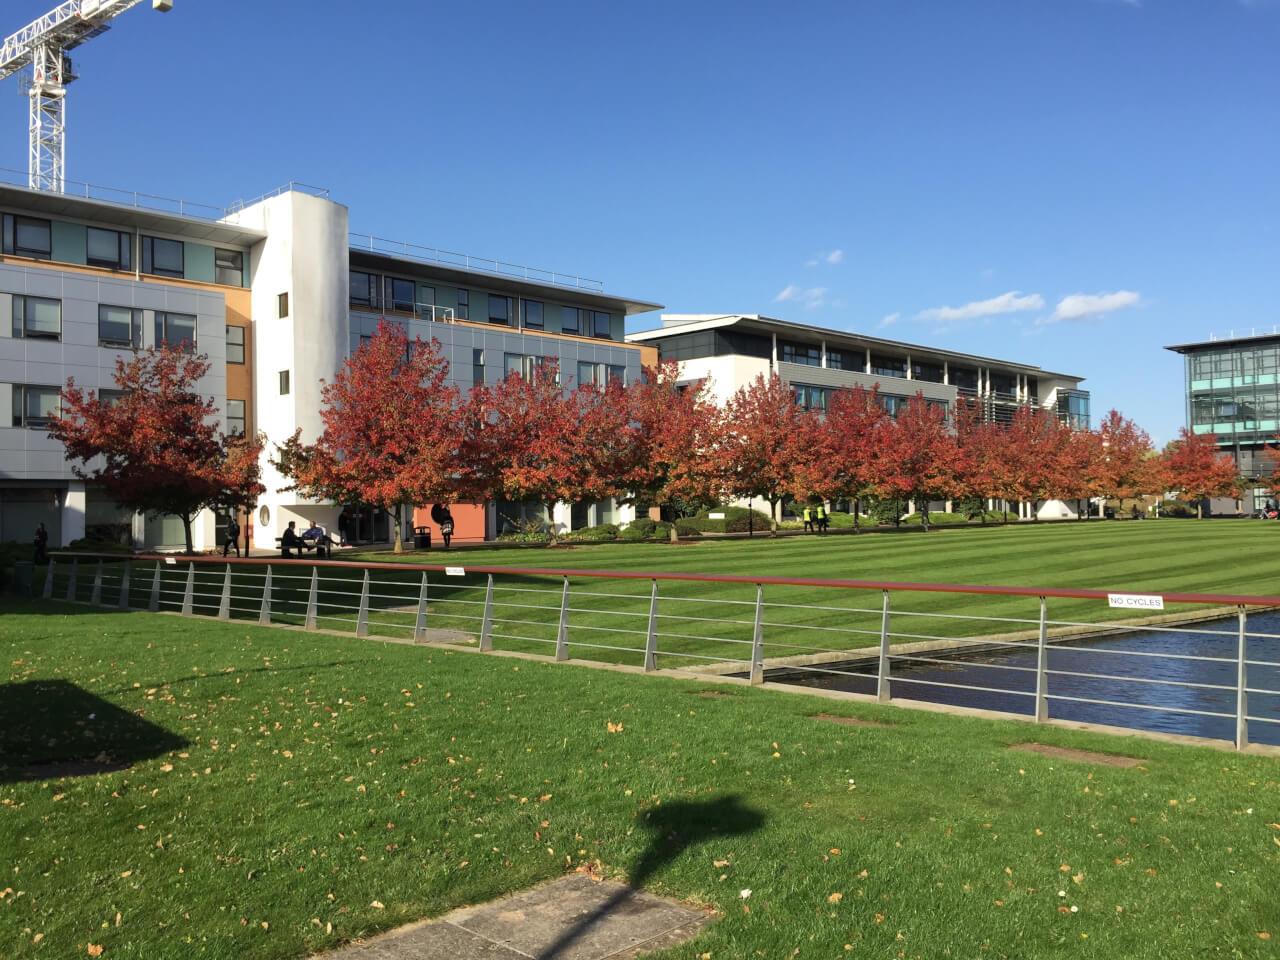 Computer Science at Warwick Q&A (Part 2)